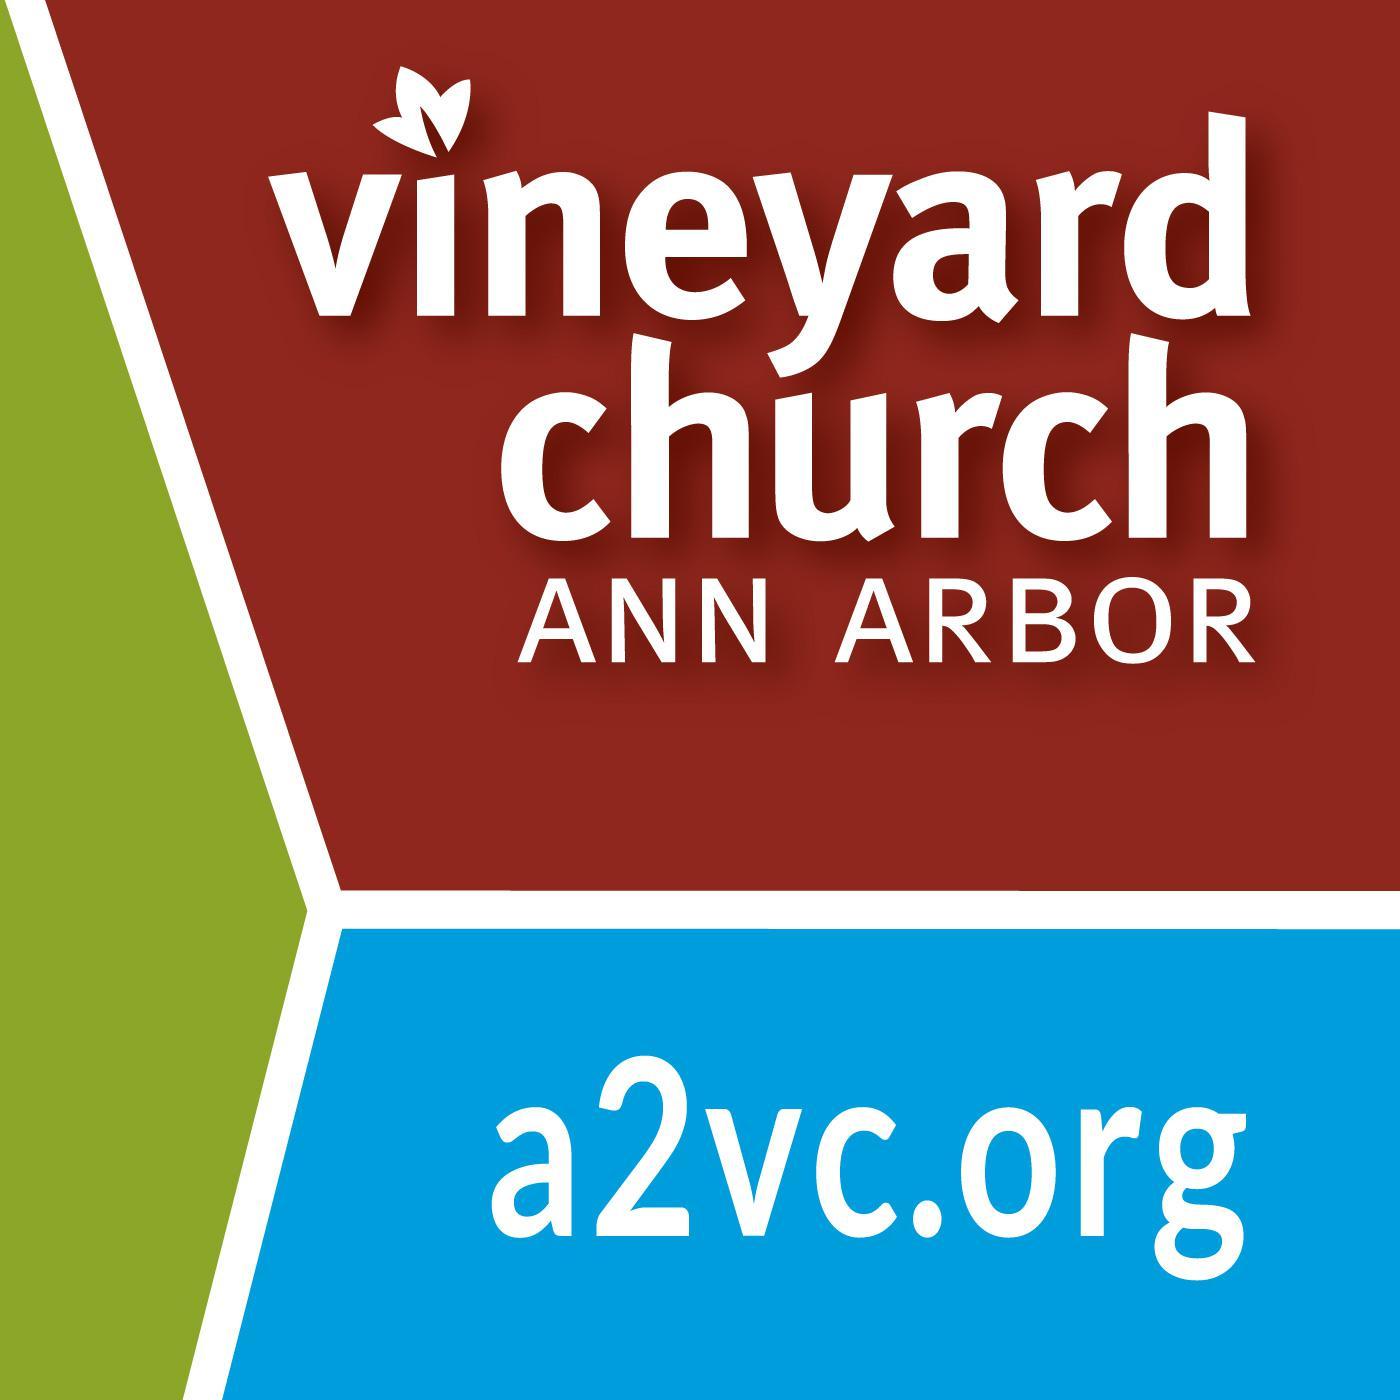 Vineyard Church of Ann Arbor Sermon Podcast - Vineyard Church of Ann